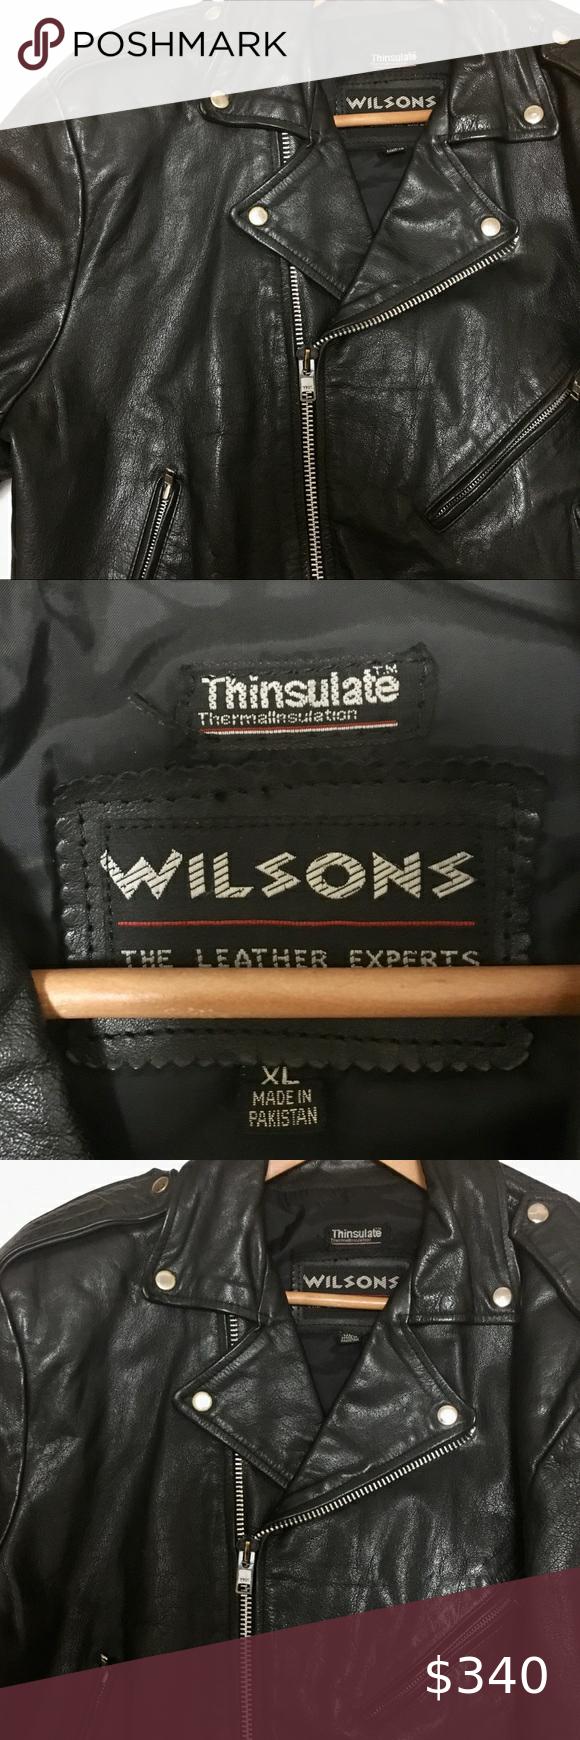 Men S Black Leather Wilson S Harley Davidson Xl Black Leather Wilsons Leather Jacket Leather [ 1740 x 580 Pixel ]